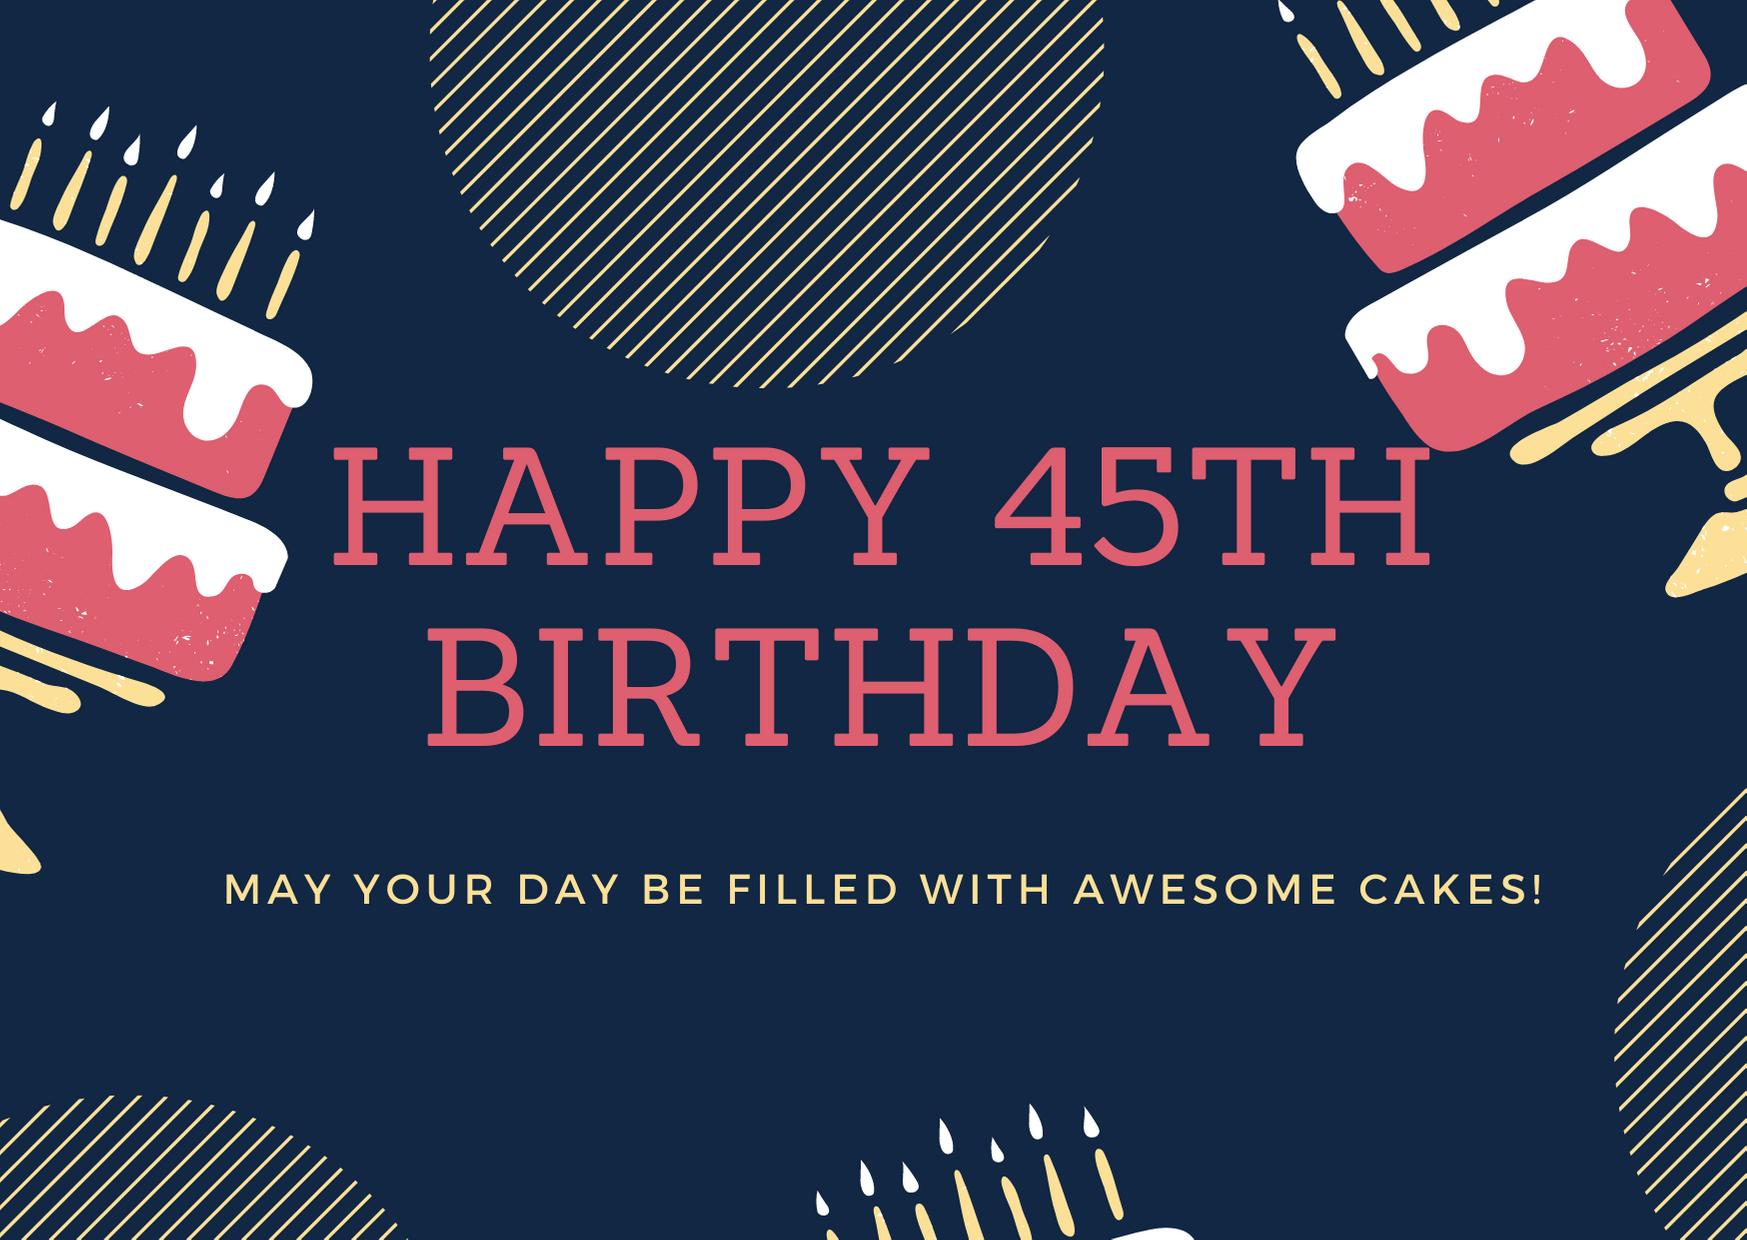 happy 45th birthday wishes